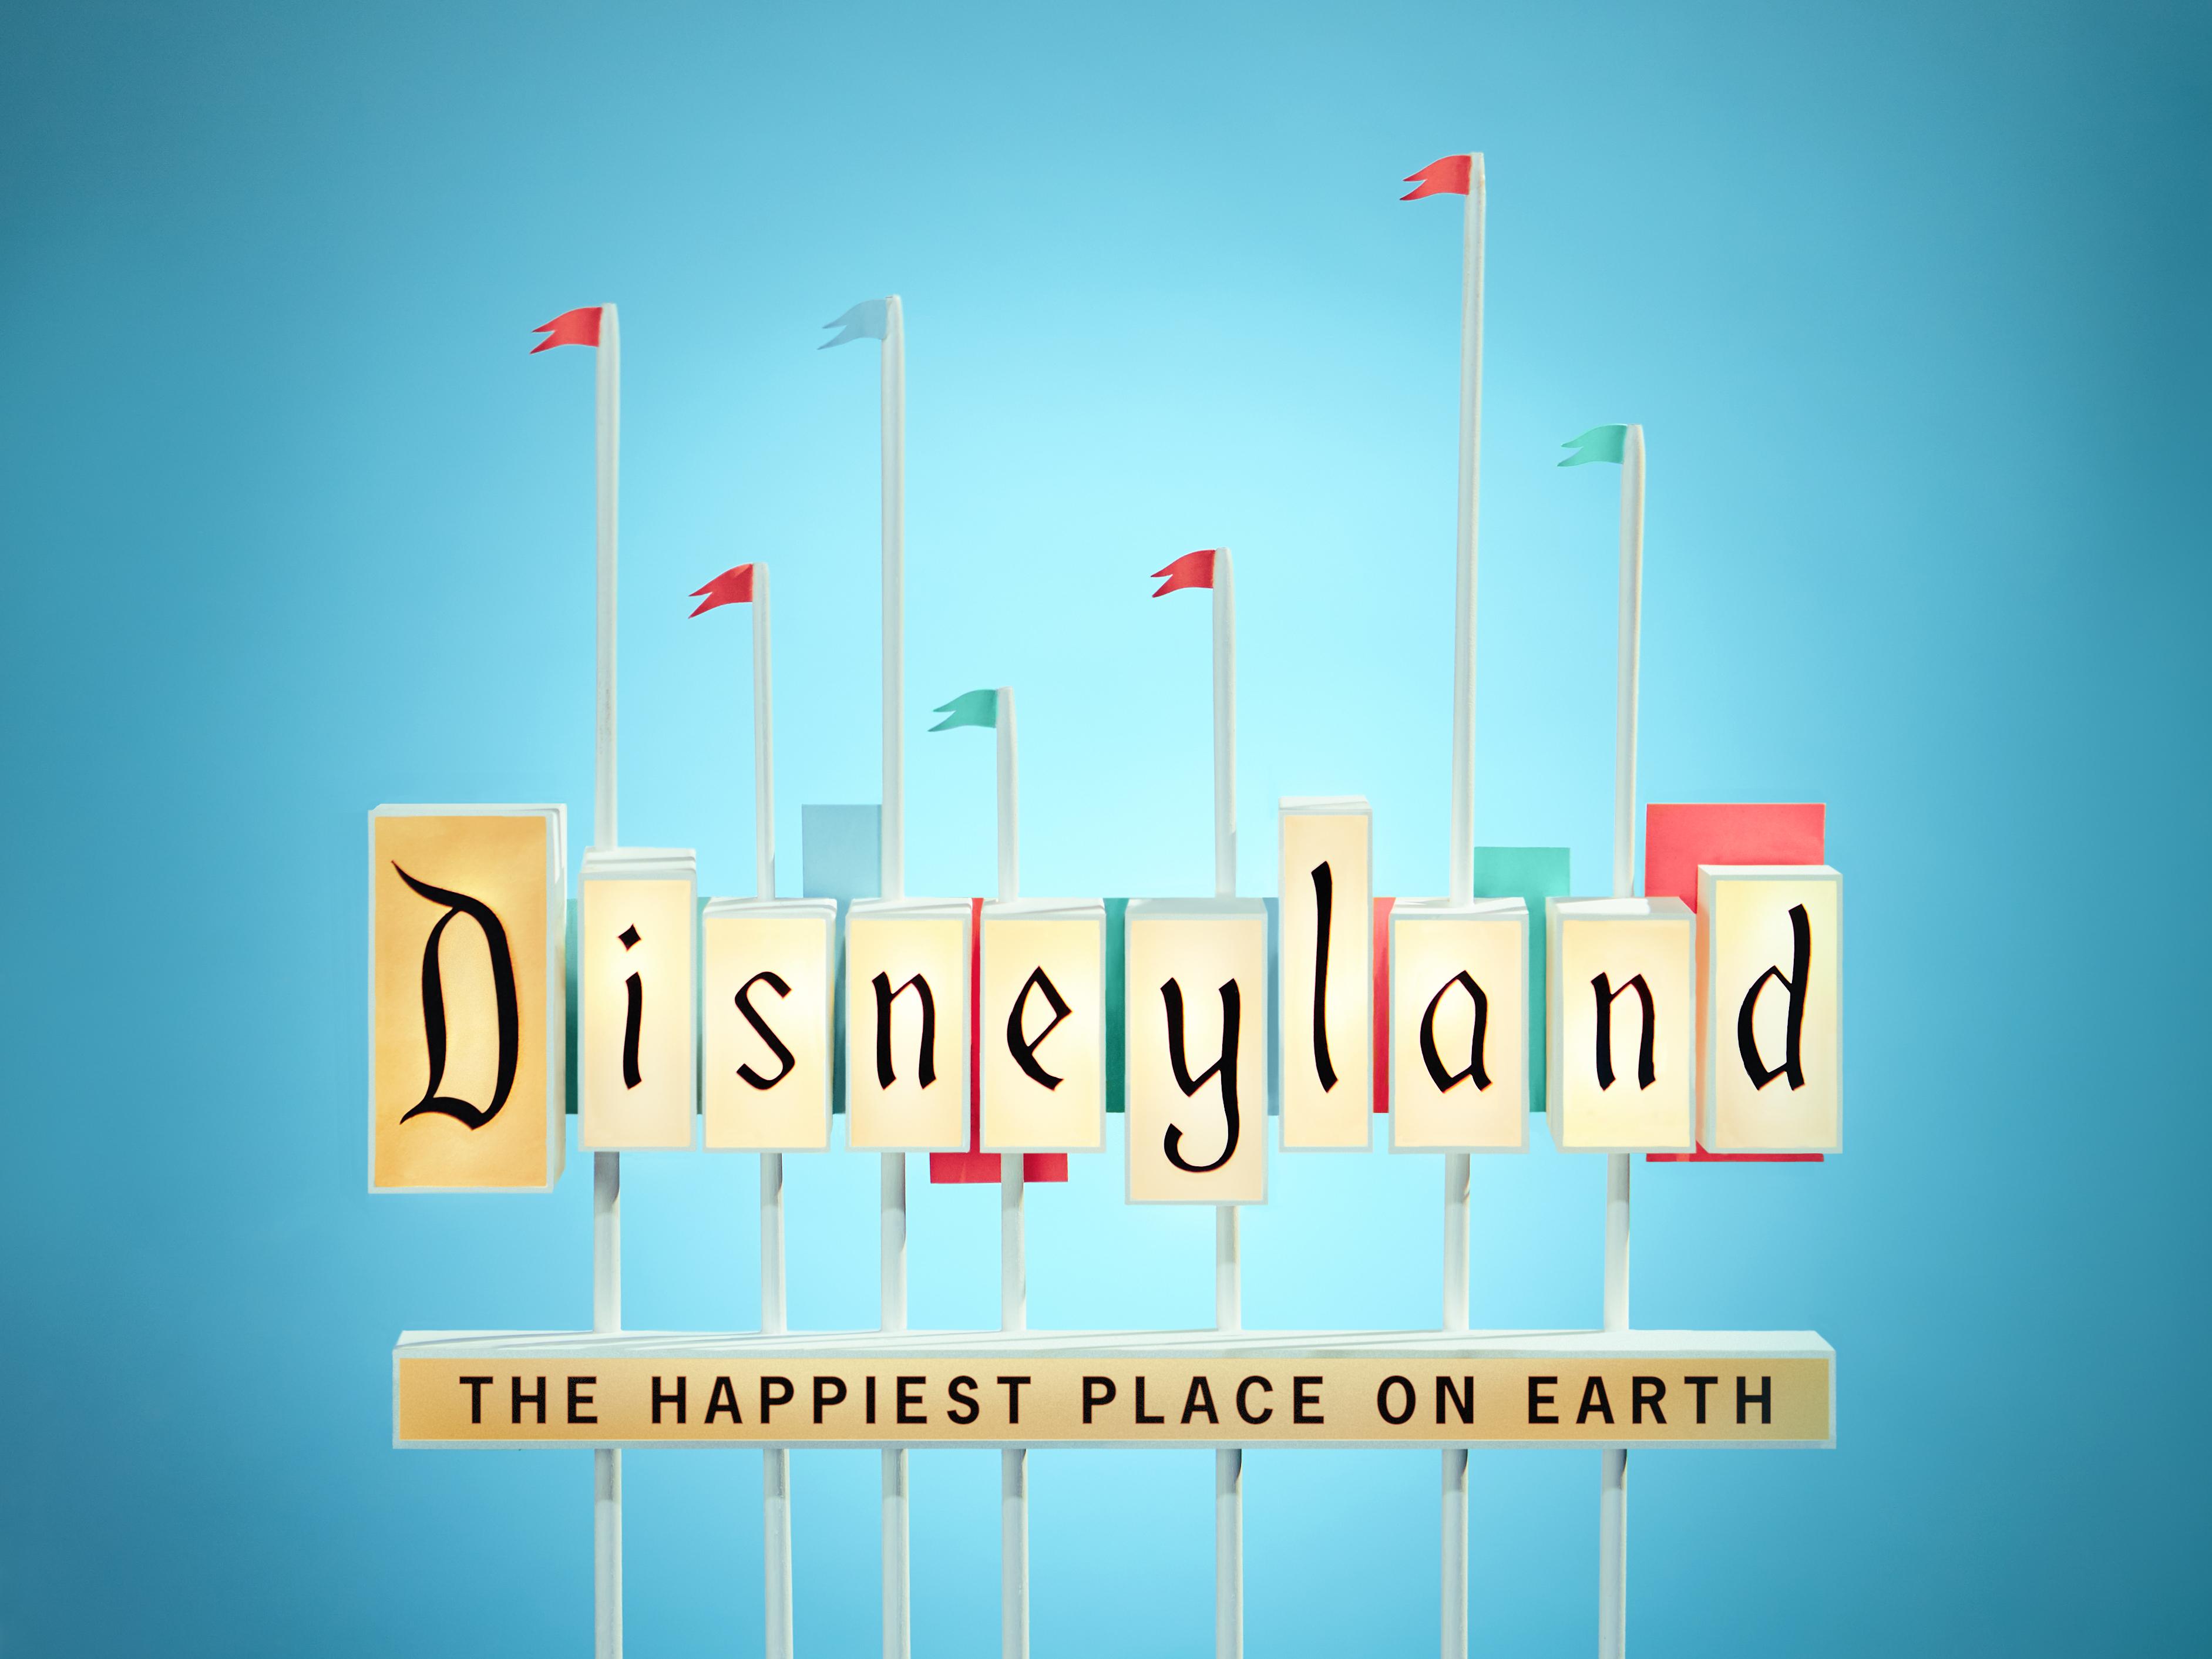 Disneyland rogie alicja